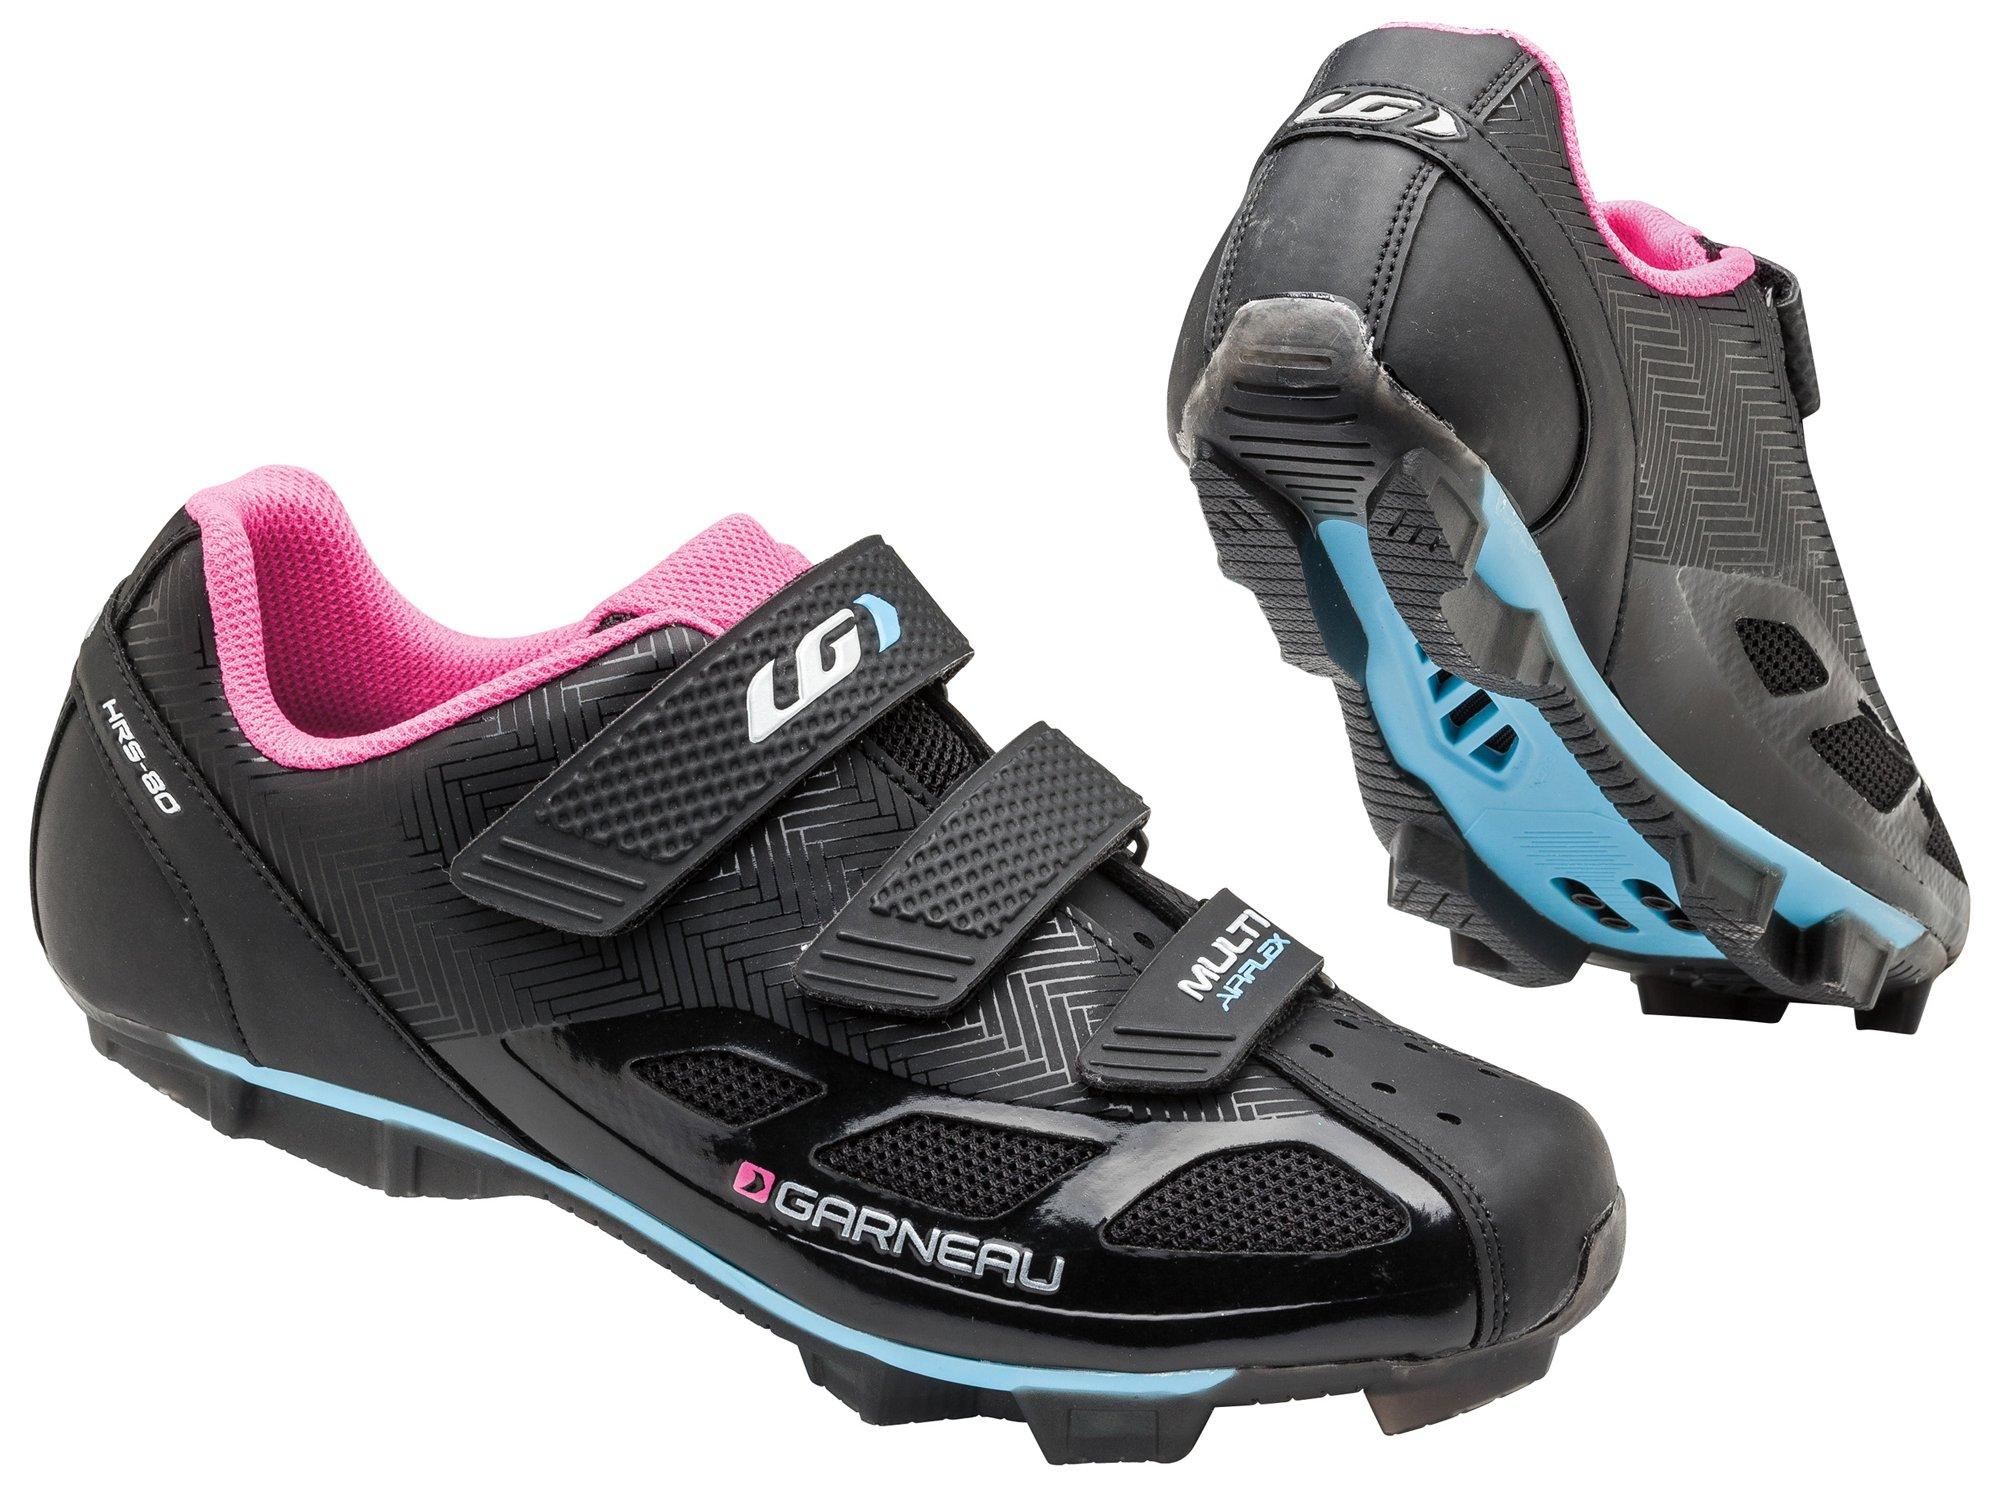 Louis Garneau Women's Multi Air Flex Bike Shoes, Black/Pink, 40